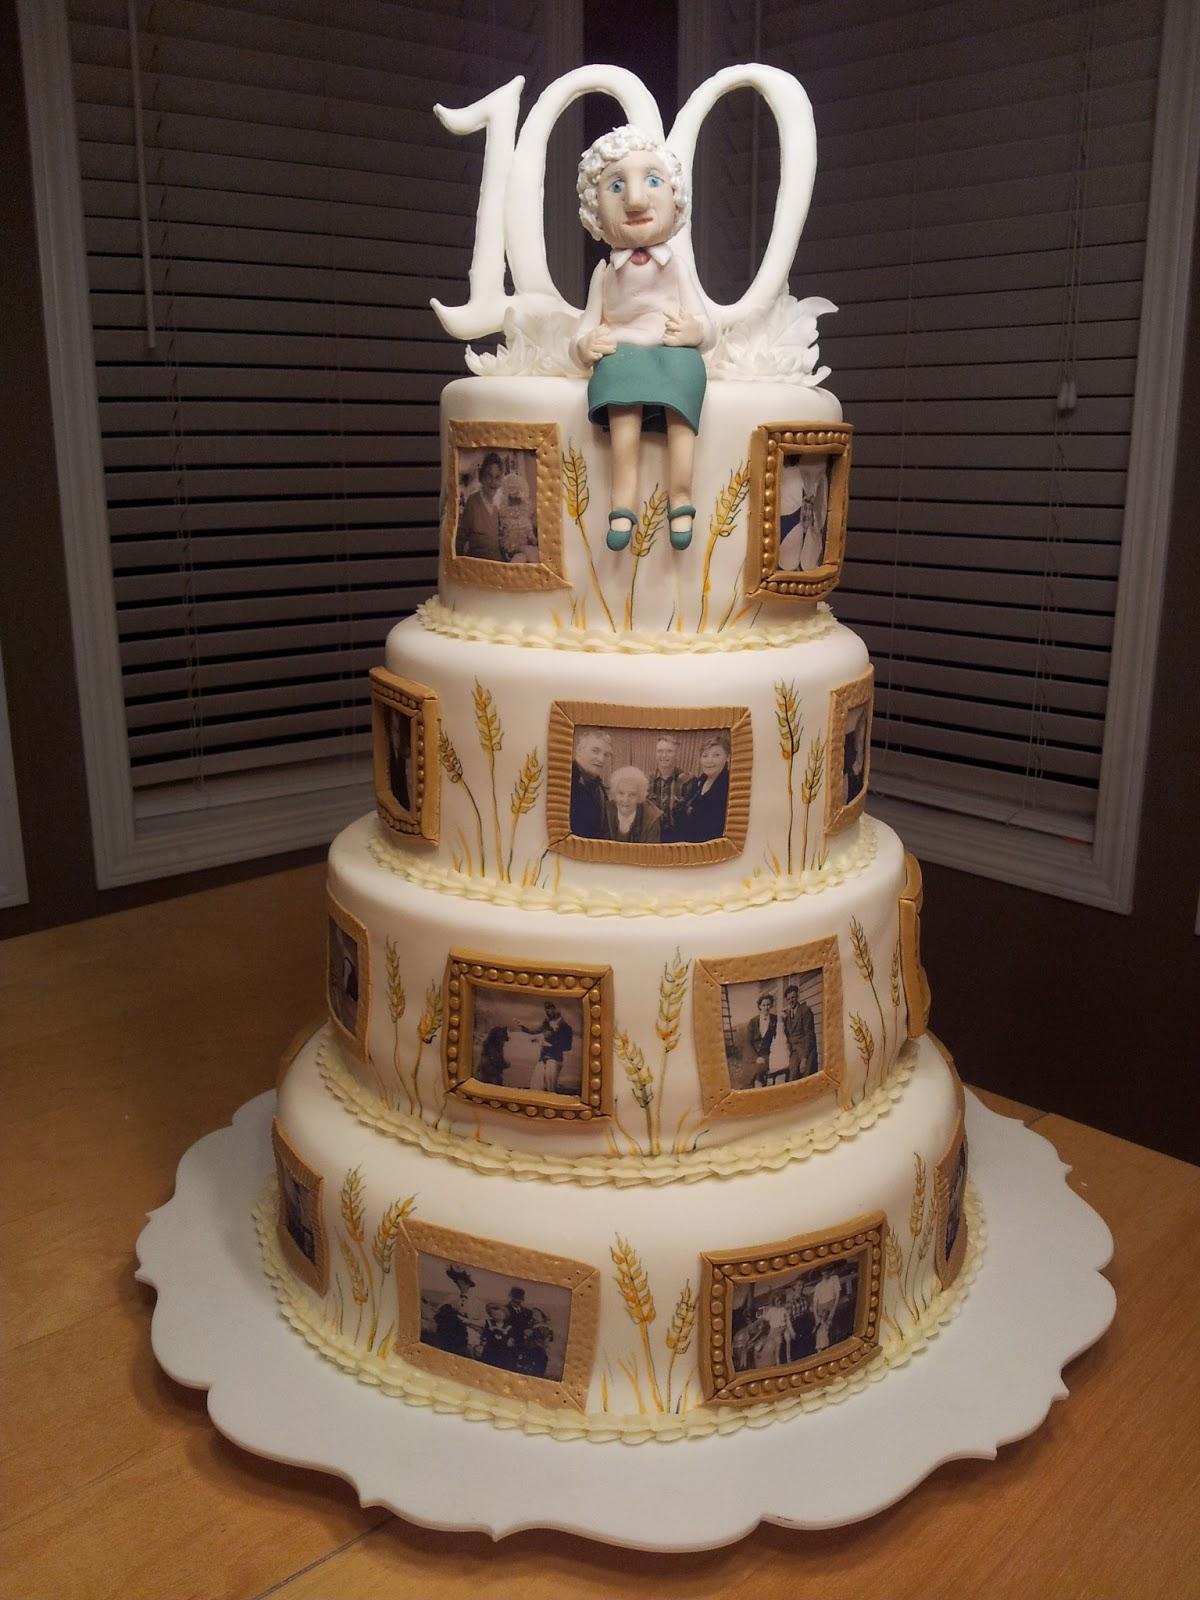 Kiddles N Bits 100th Birthday Cake